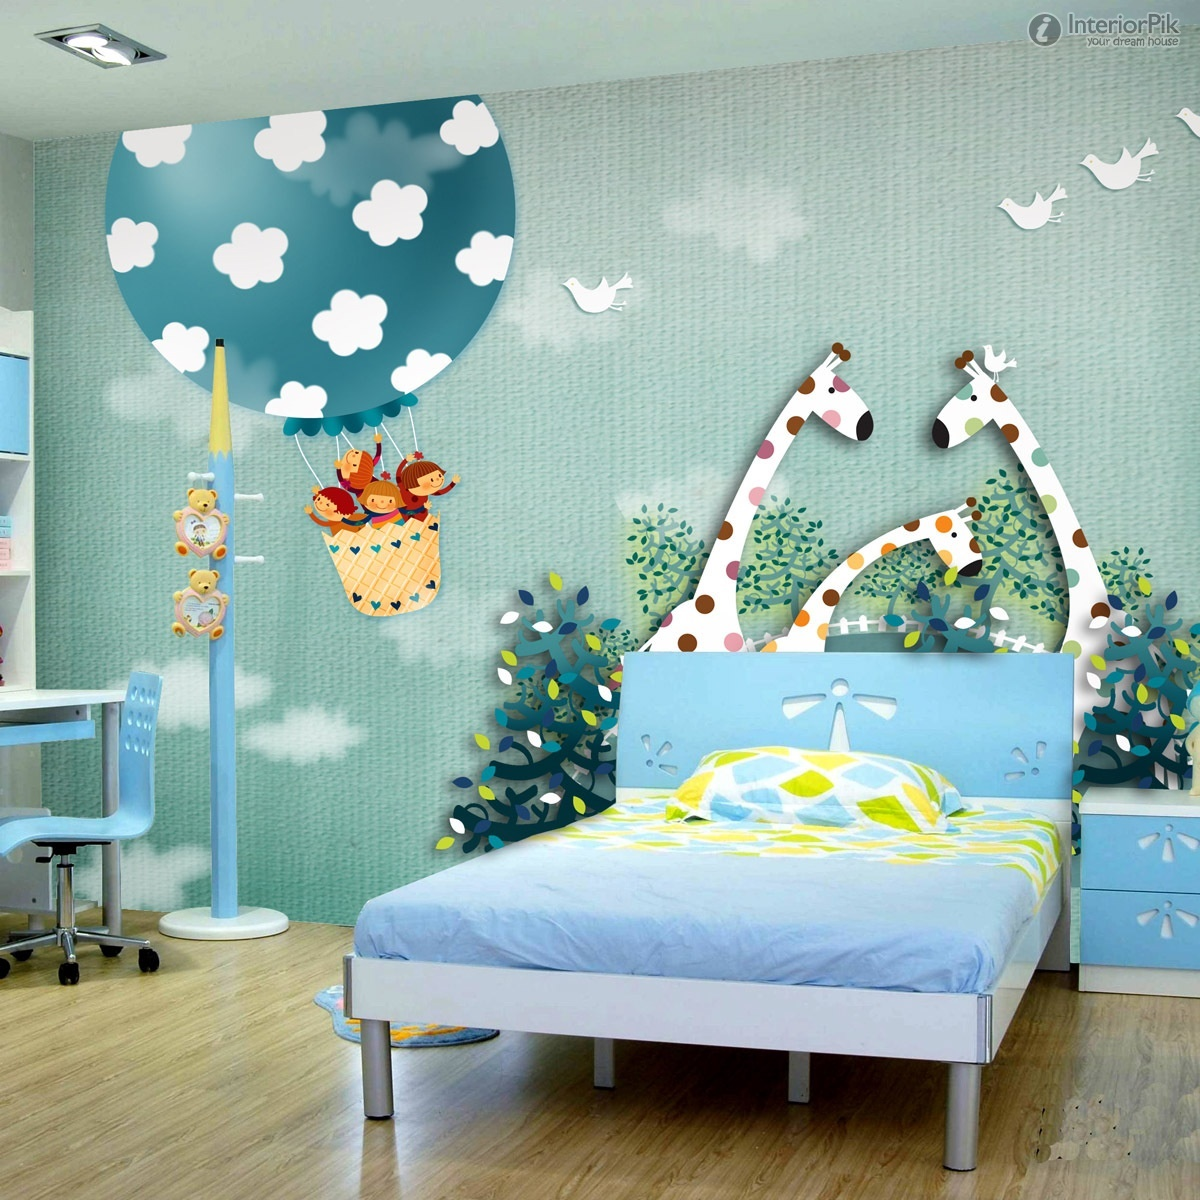 Free Download Due To Kids Room Wallpaper Design Kids Room Wallpaper Hd Kids Room 1200x1200 For Your Desktop Mobile Tablet Explore 46 Kids Room Wallpaper Designs Wallpaper For Rooms